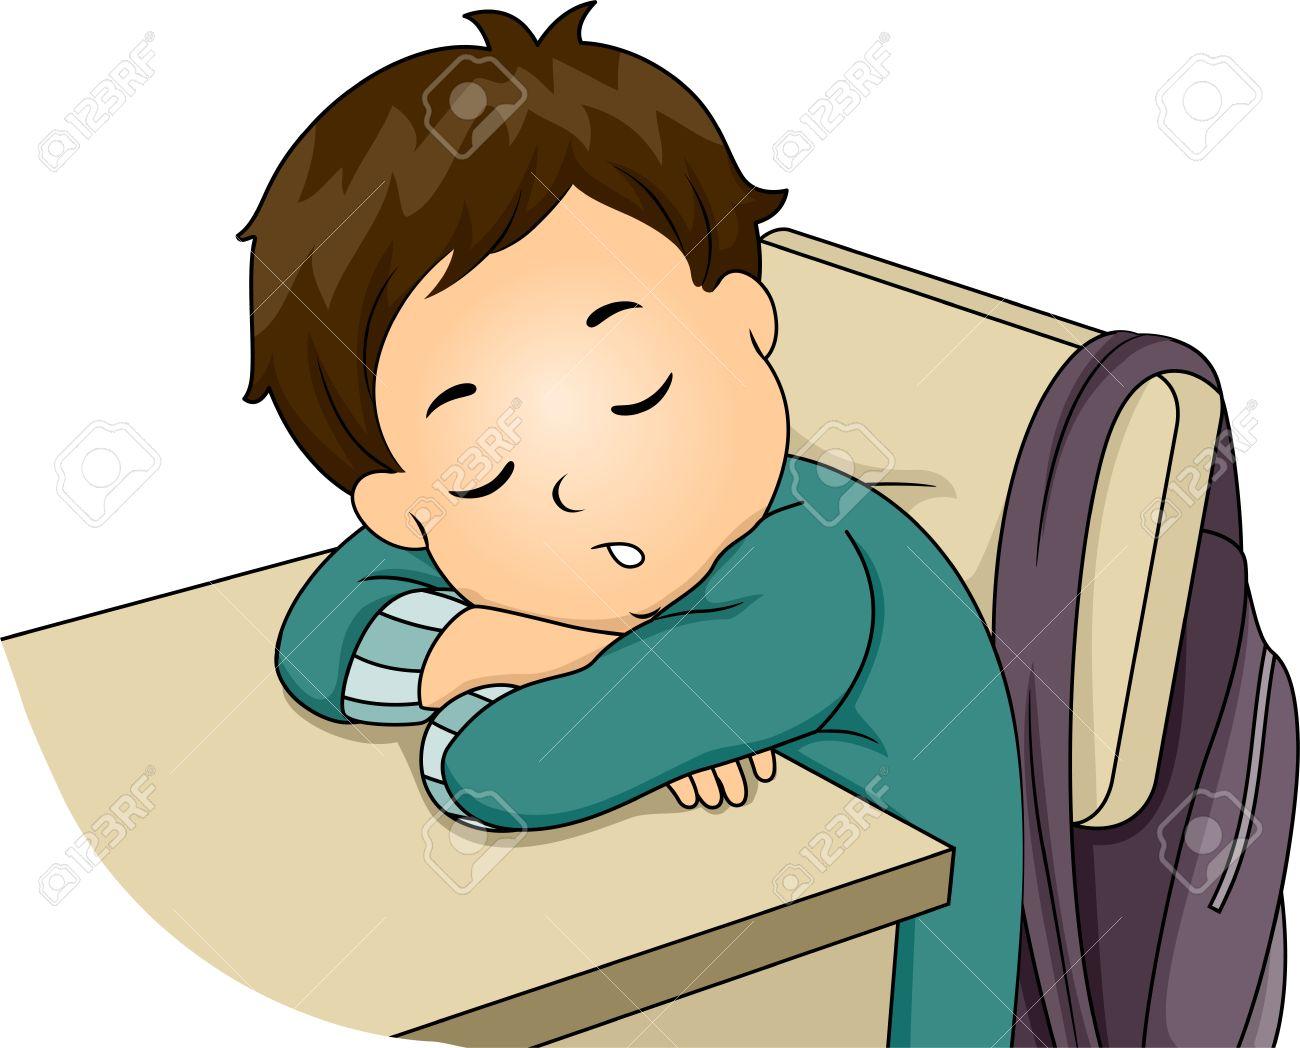 Illustration Featuring a Little Boy Sleeping in Class.